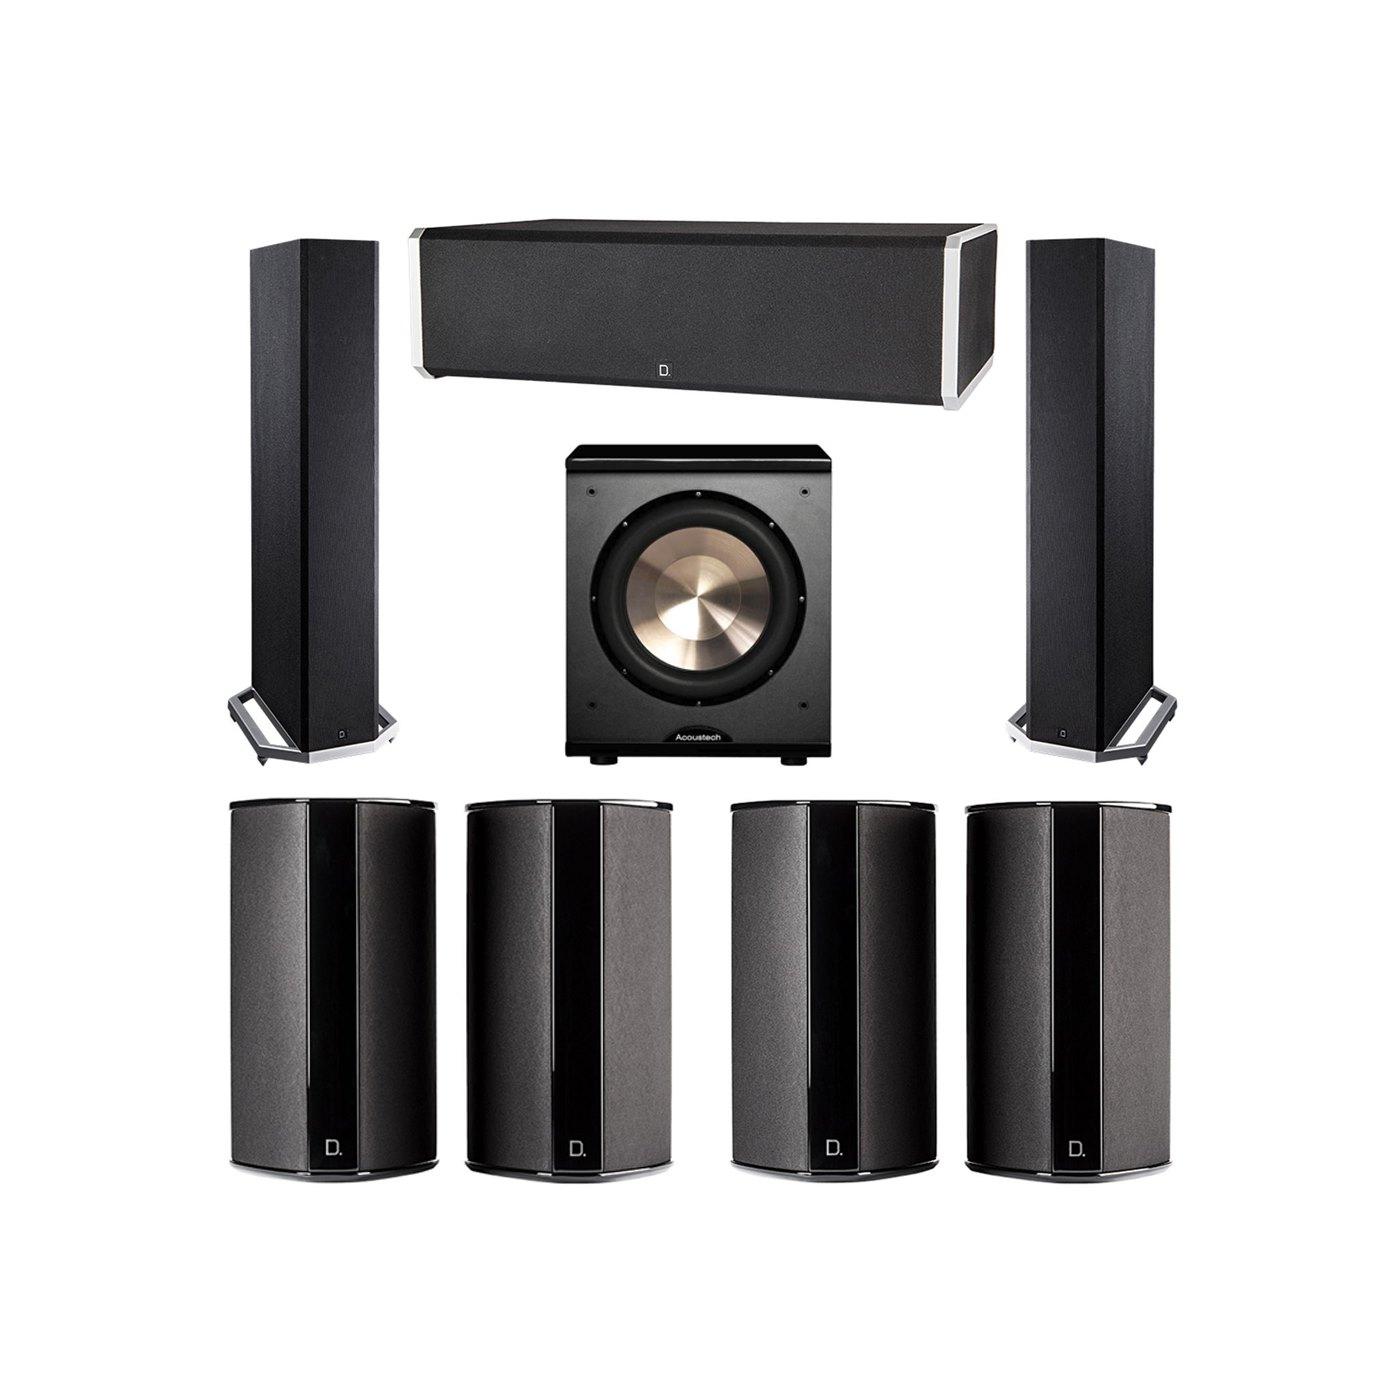 Definitive Technology 7.1 System with 2 BP9020 Tower Speakers, 1 CS9060 Center Channel Speaker, 4 SR9080 Surround Speaker, 1 BIC PL-200 Subwoofer